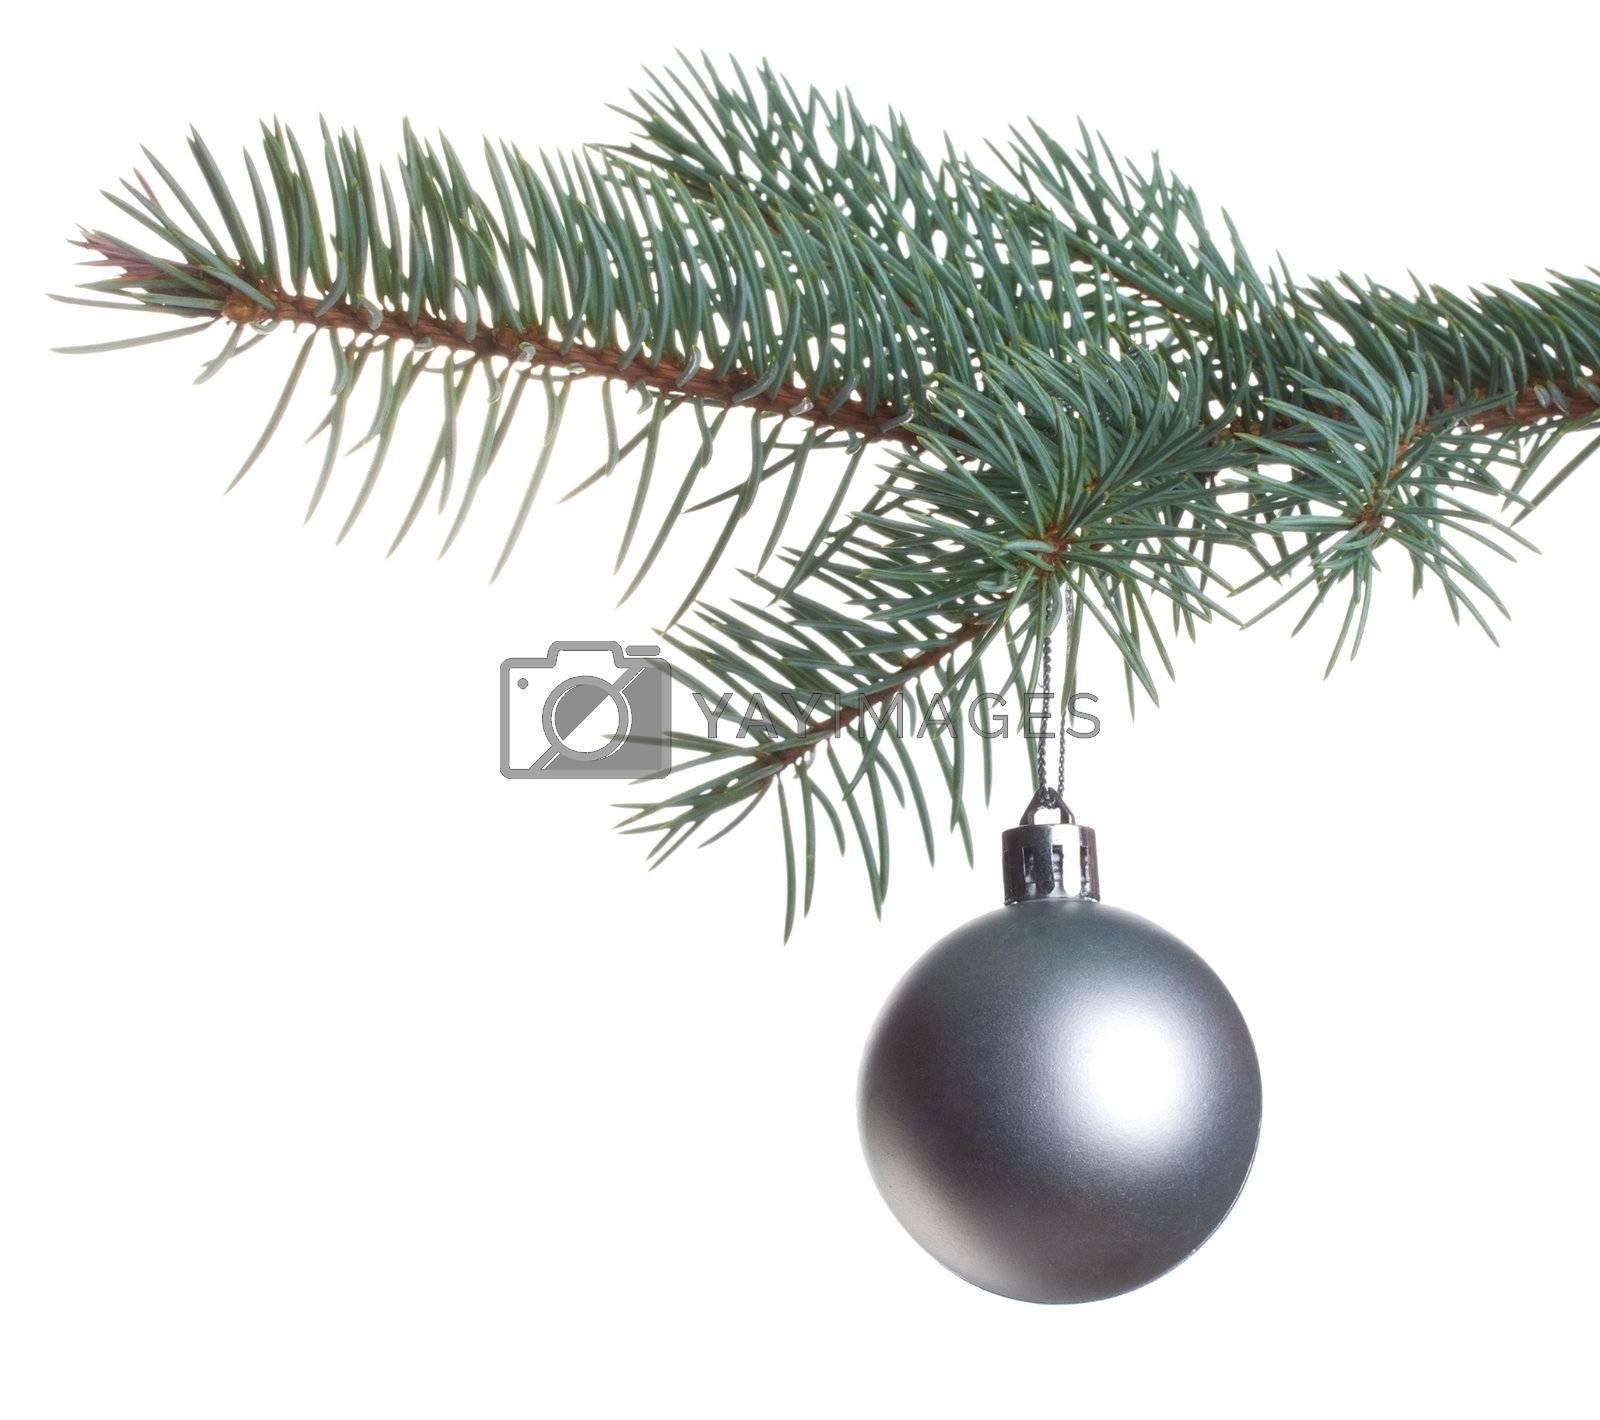 silver ball on fir branch by Alekcey